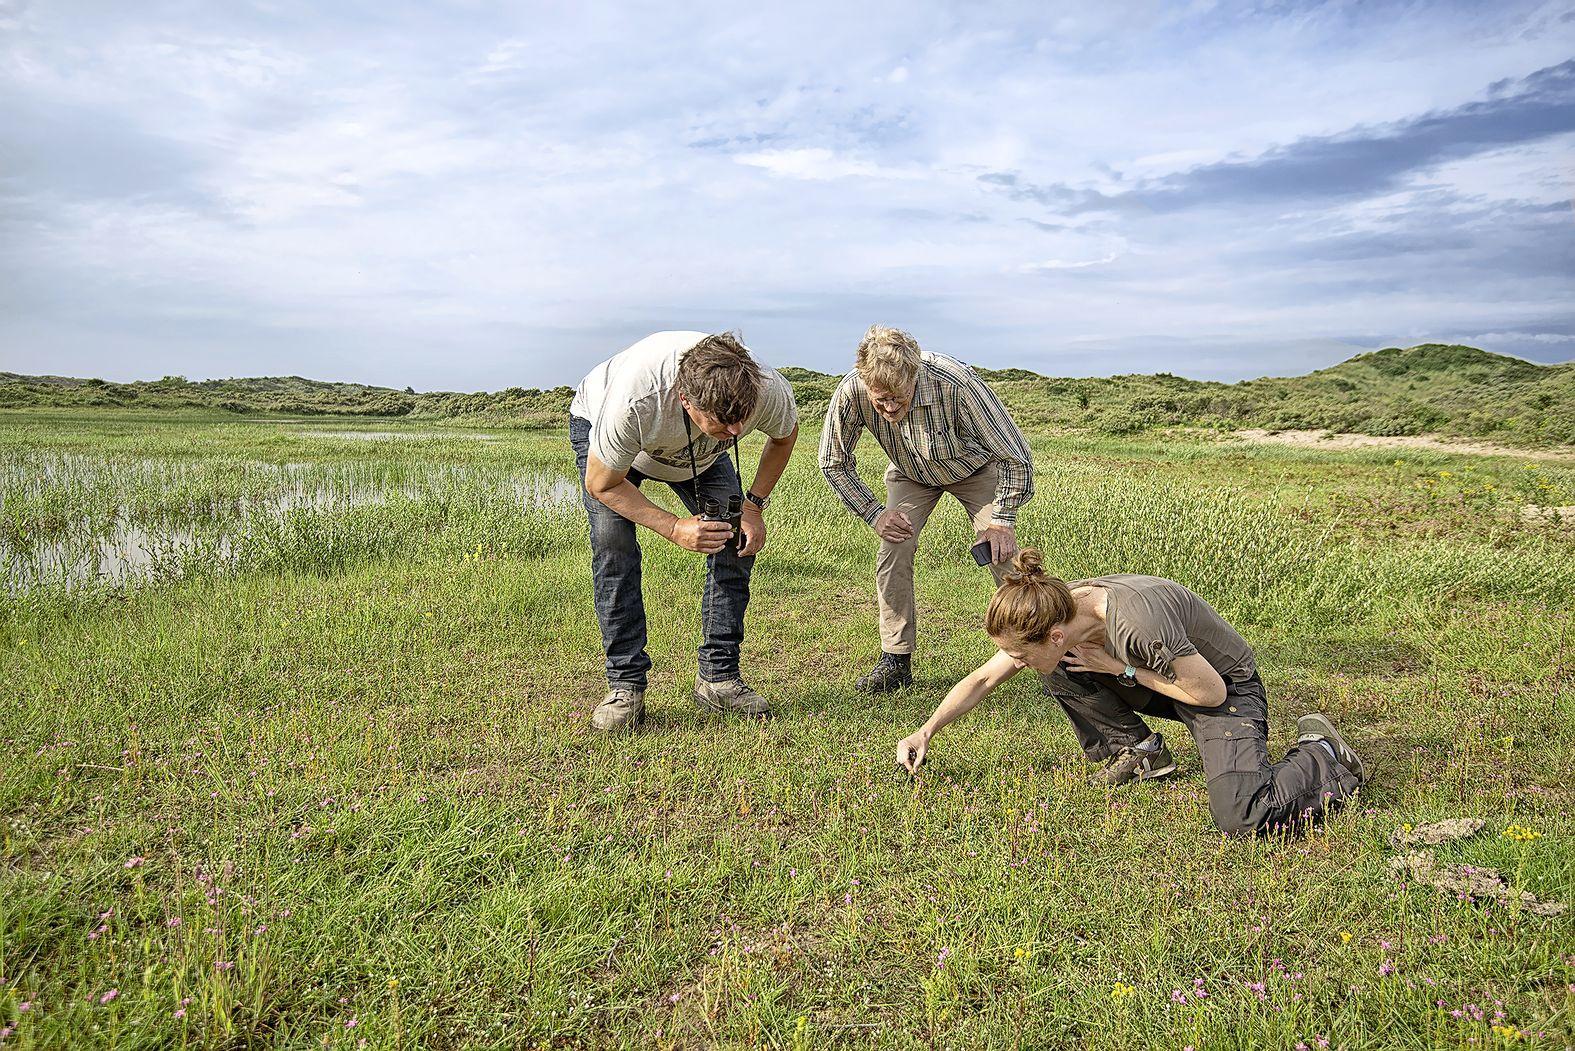 Van vogeltelpost tot strandpaal: nieuwe route rond Vogelmeer in Nationaal Park Zuid-Kennemerland